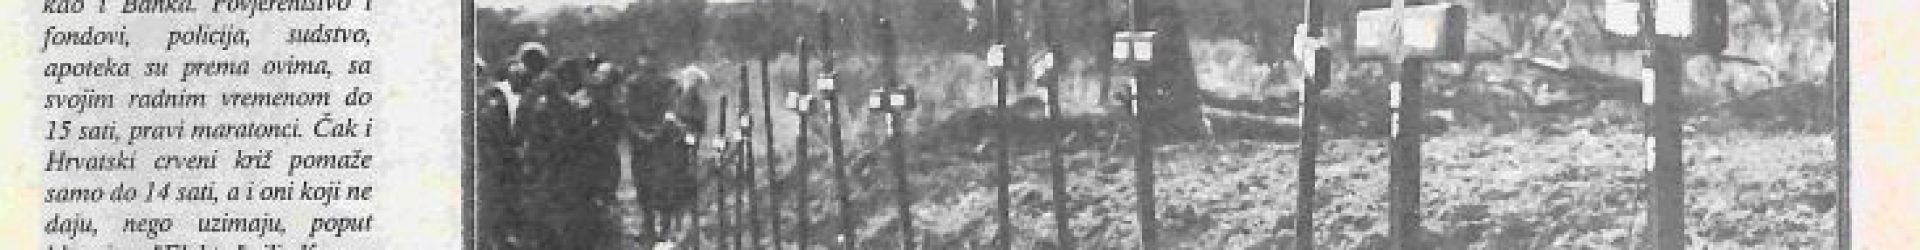 2019-03-11 13_29_58-Pakrački list broj 10. Datum 04.11.1992..pdf - Foxit Reader